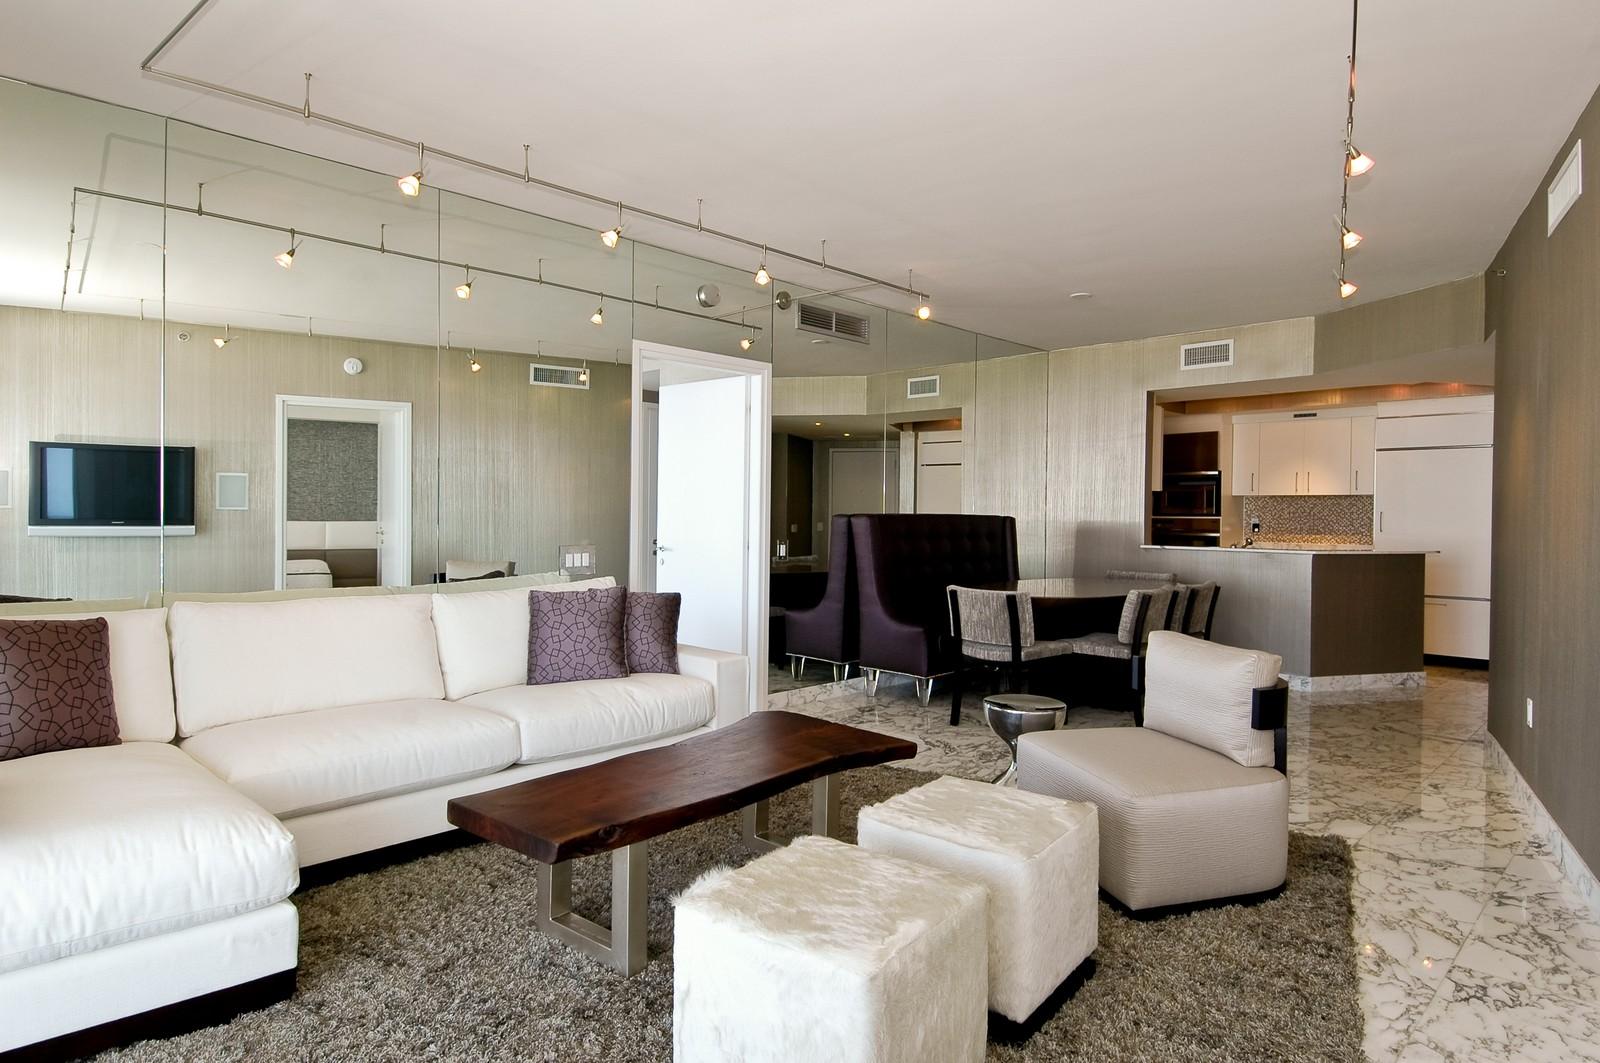 Real Estate Photography - 450 Alton Rd, Unit 2910, Miami Beach, FL, 33139 - Kitchen / Living Room